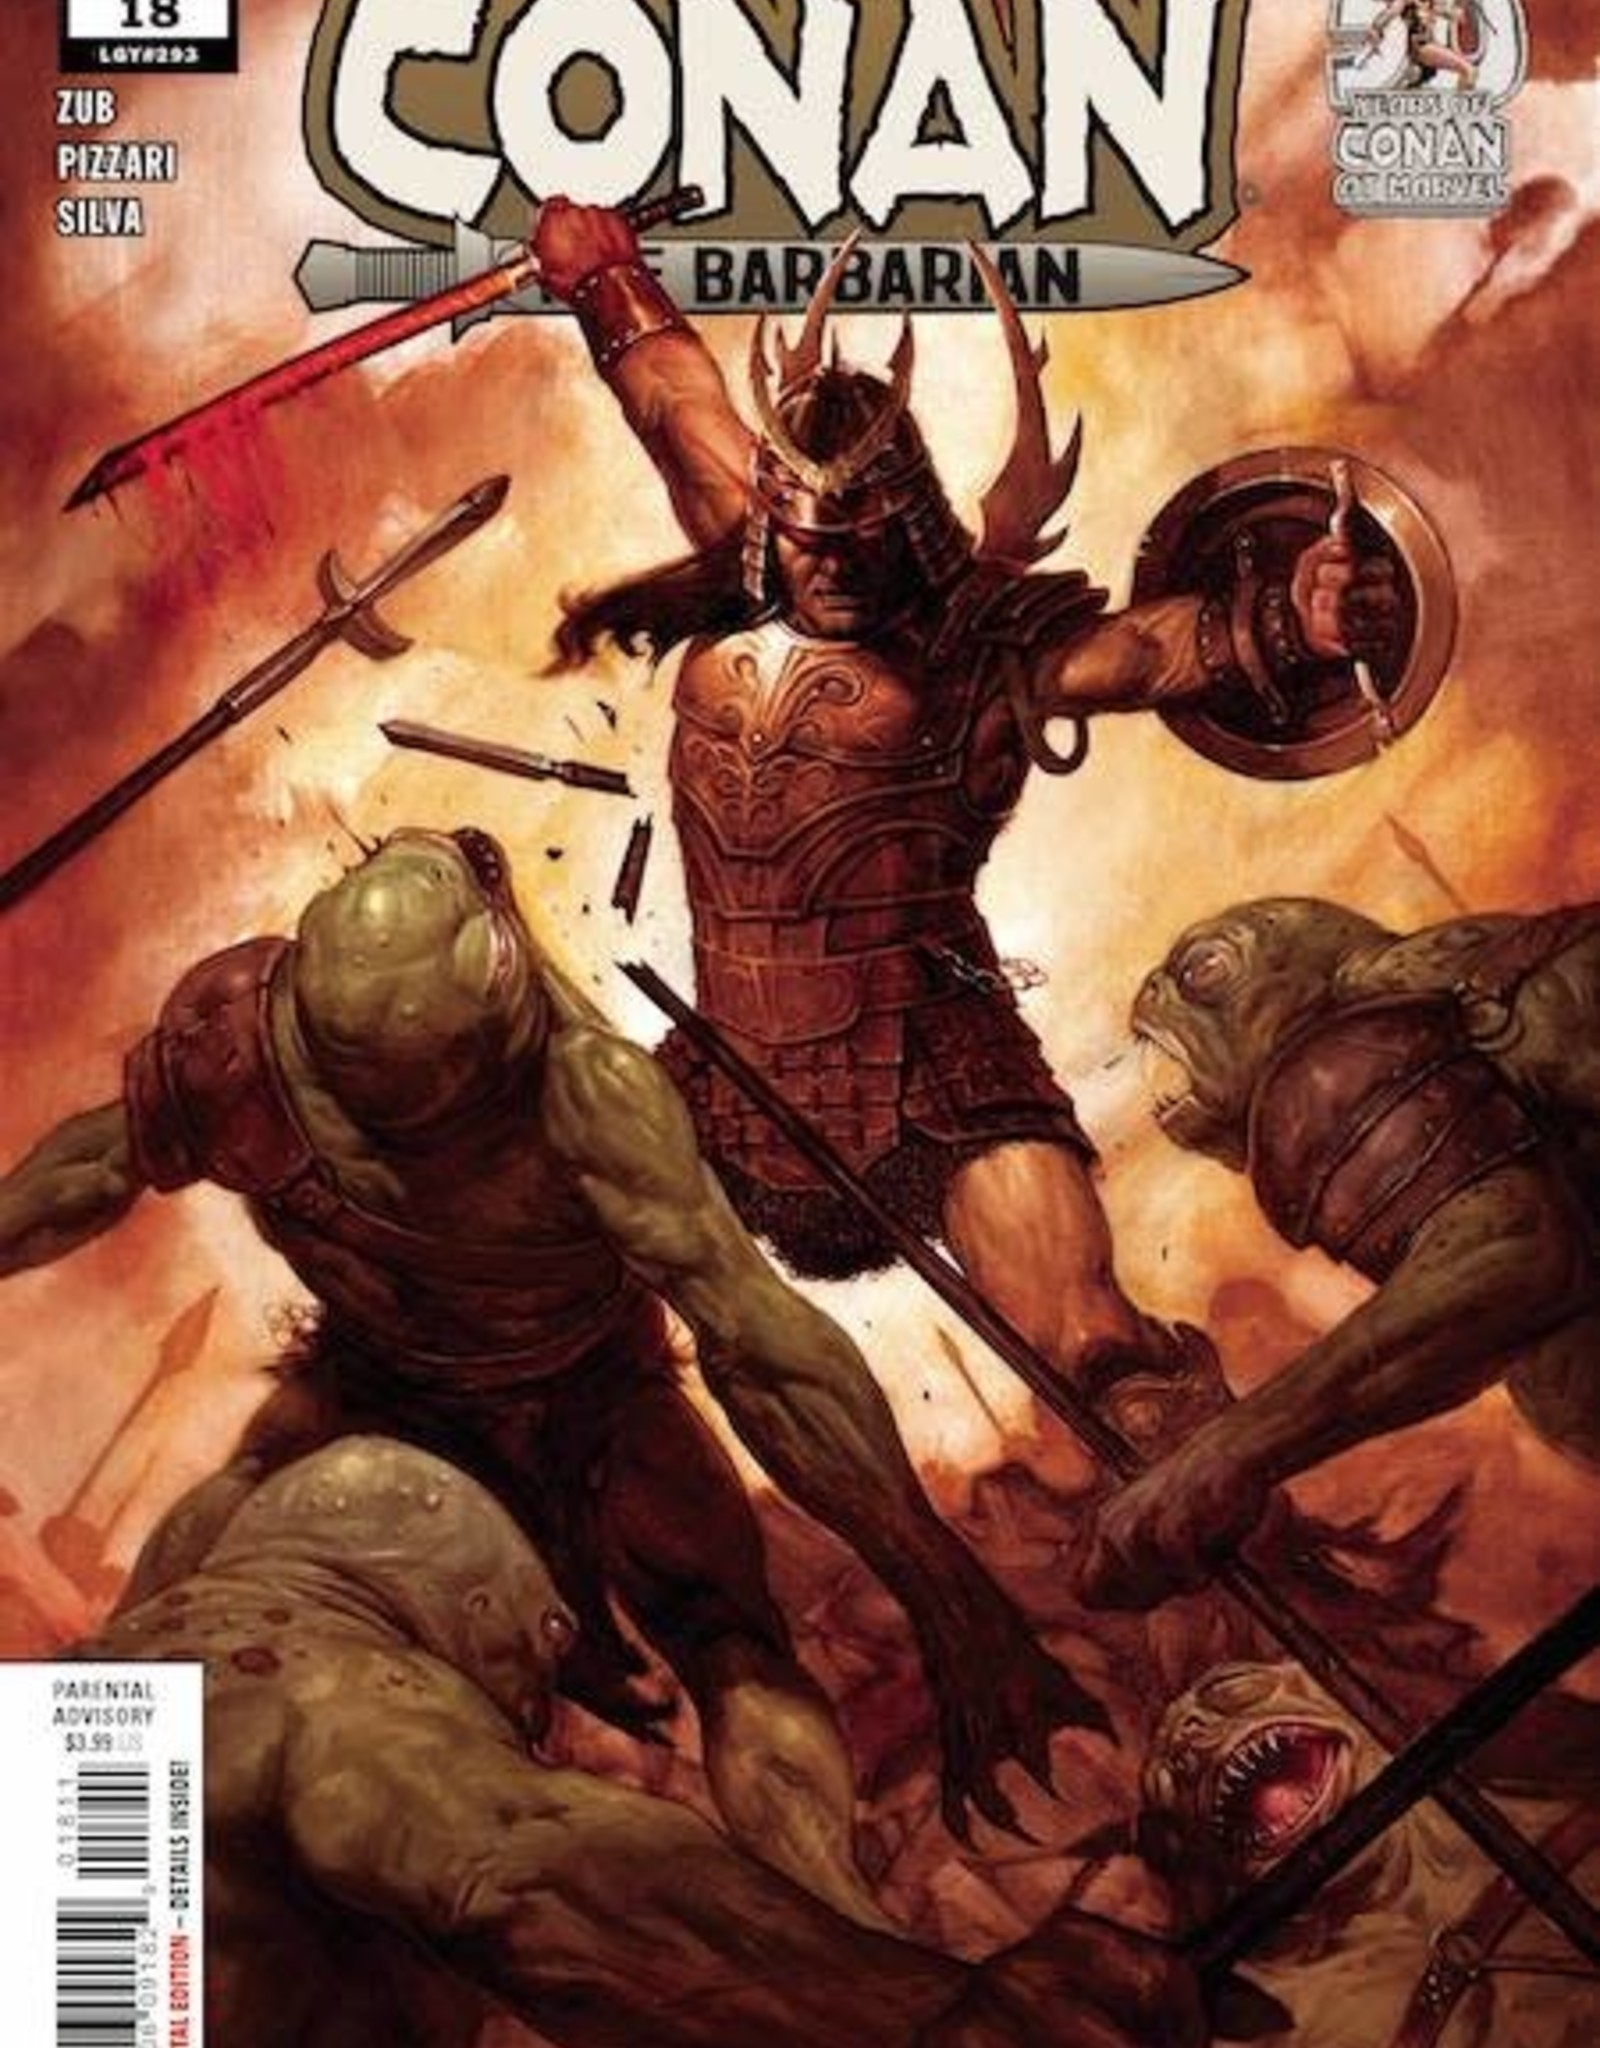 Marvel Comics Conan The Barbarian #18